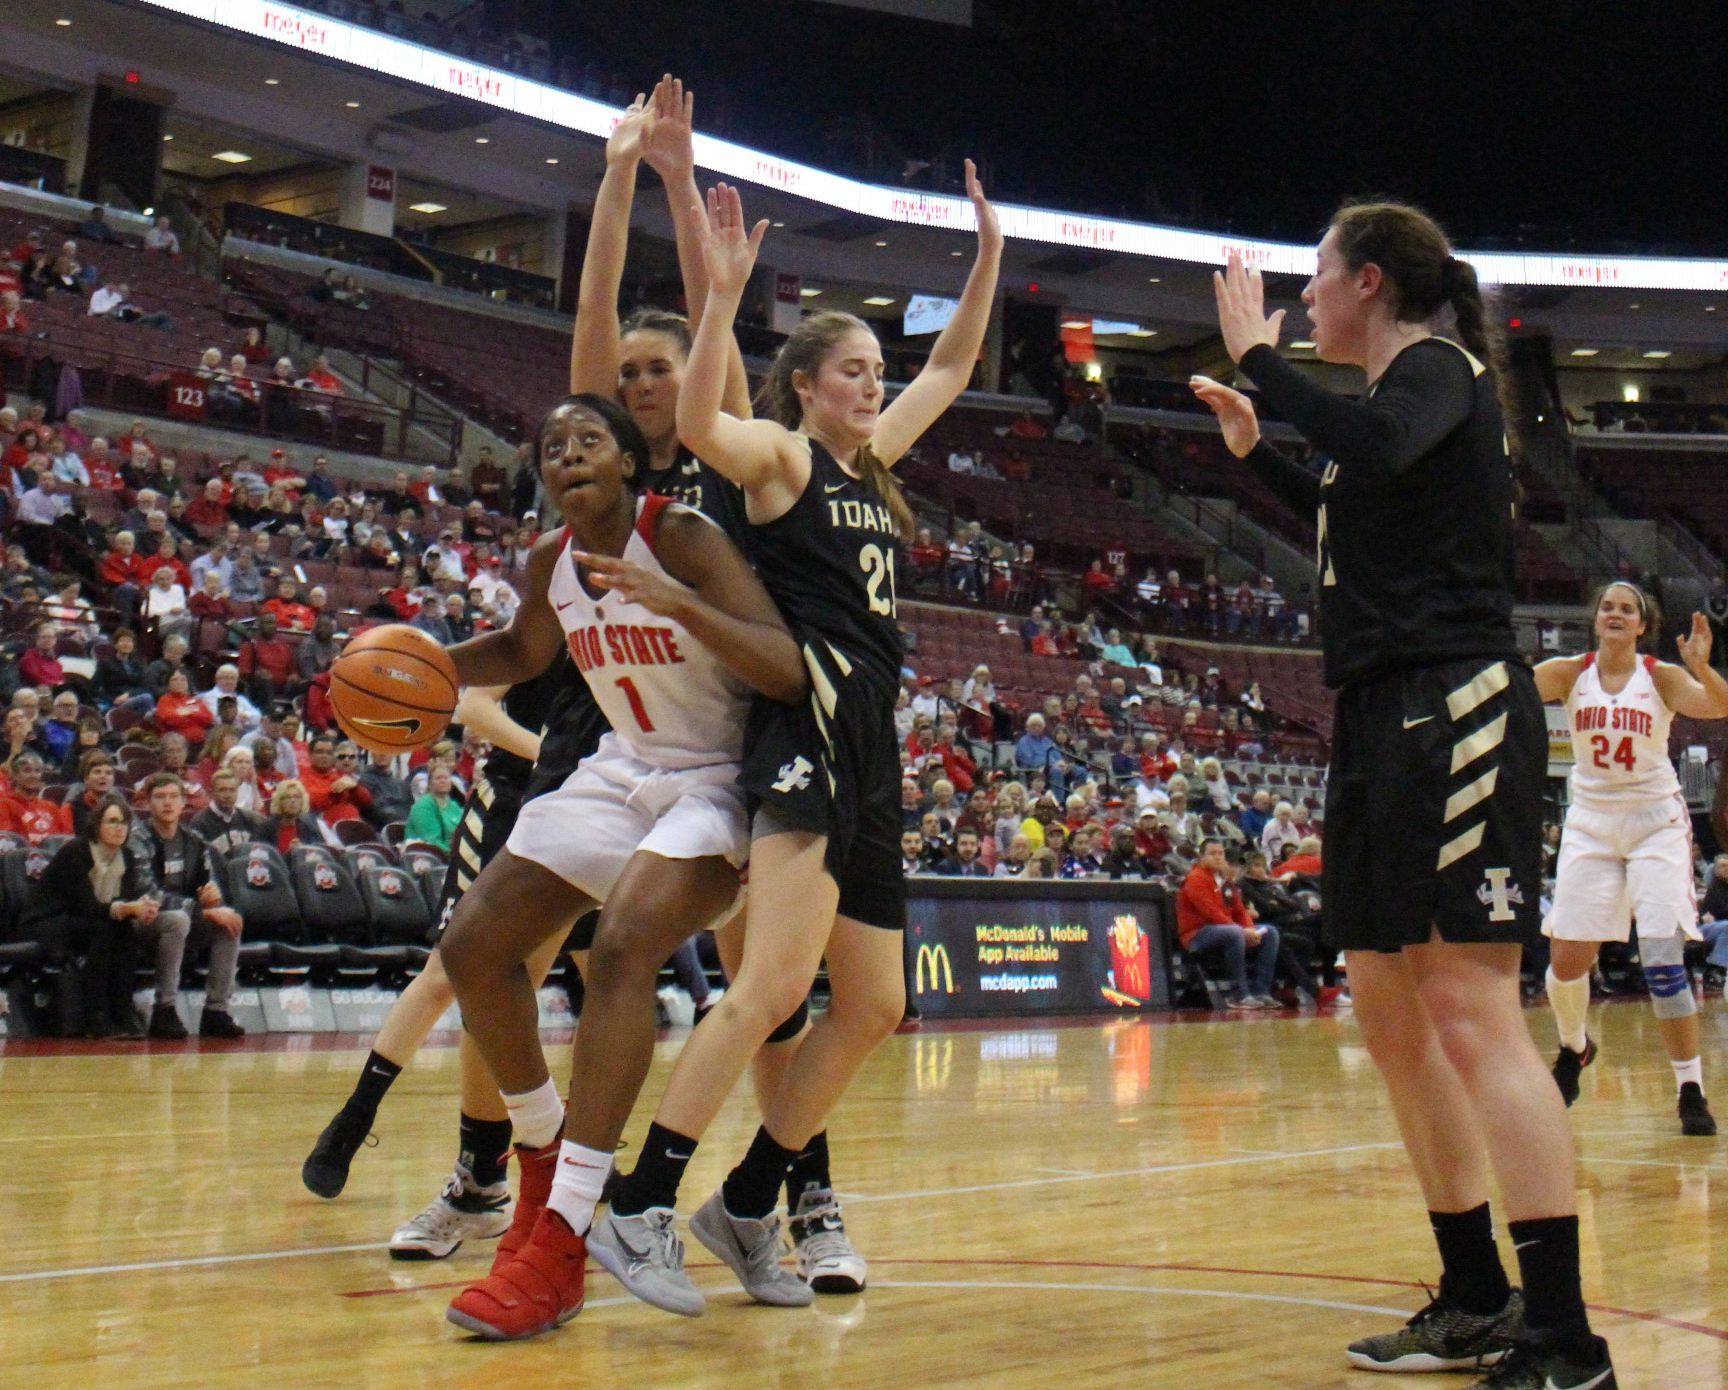 Women's Basketball: No. 9 Ohio State decimates Memphis 100-69